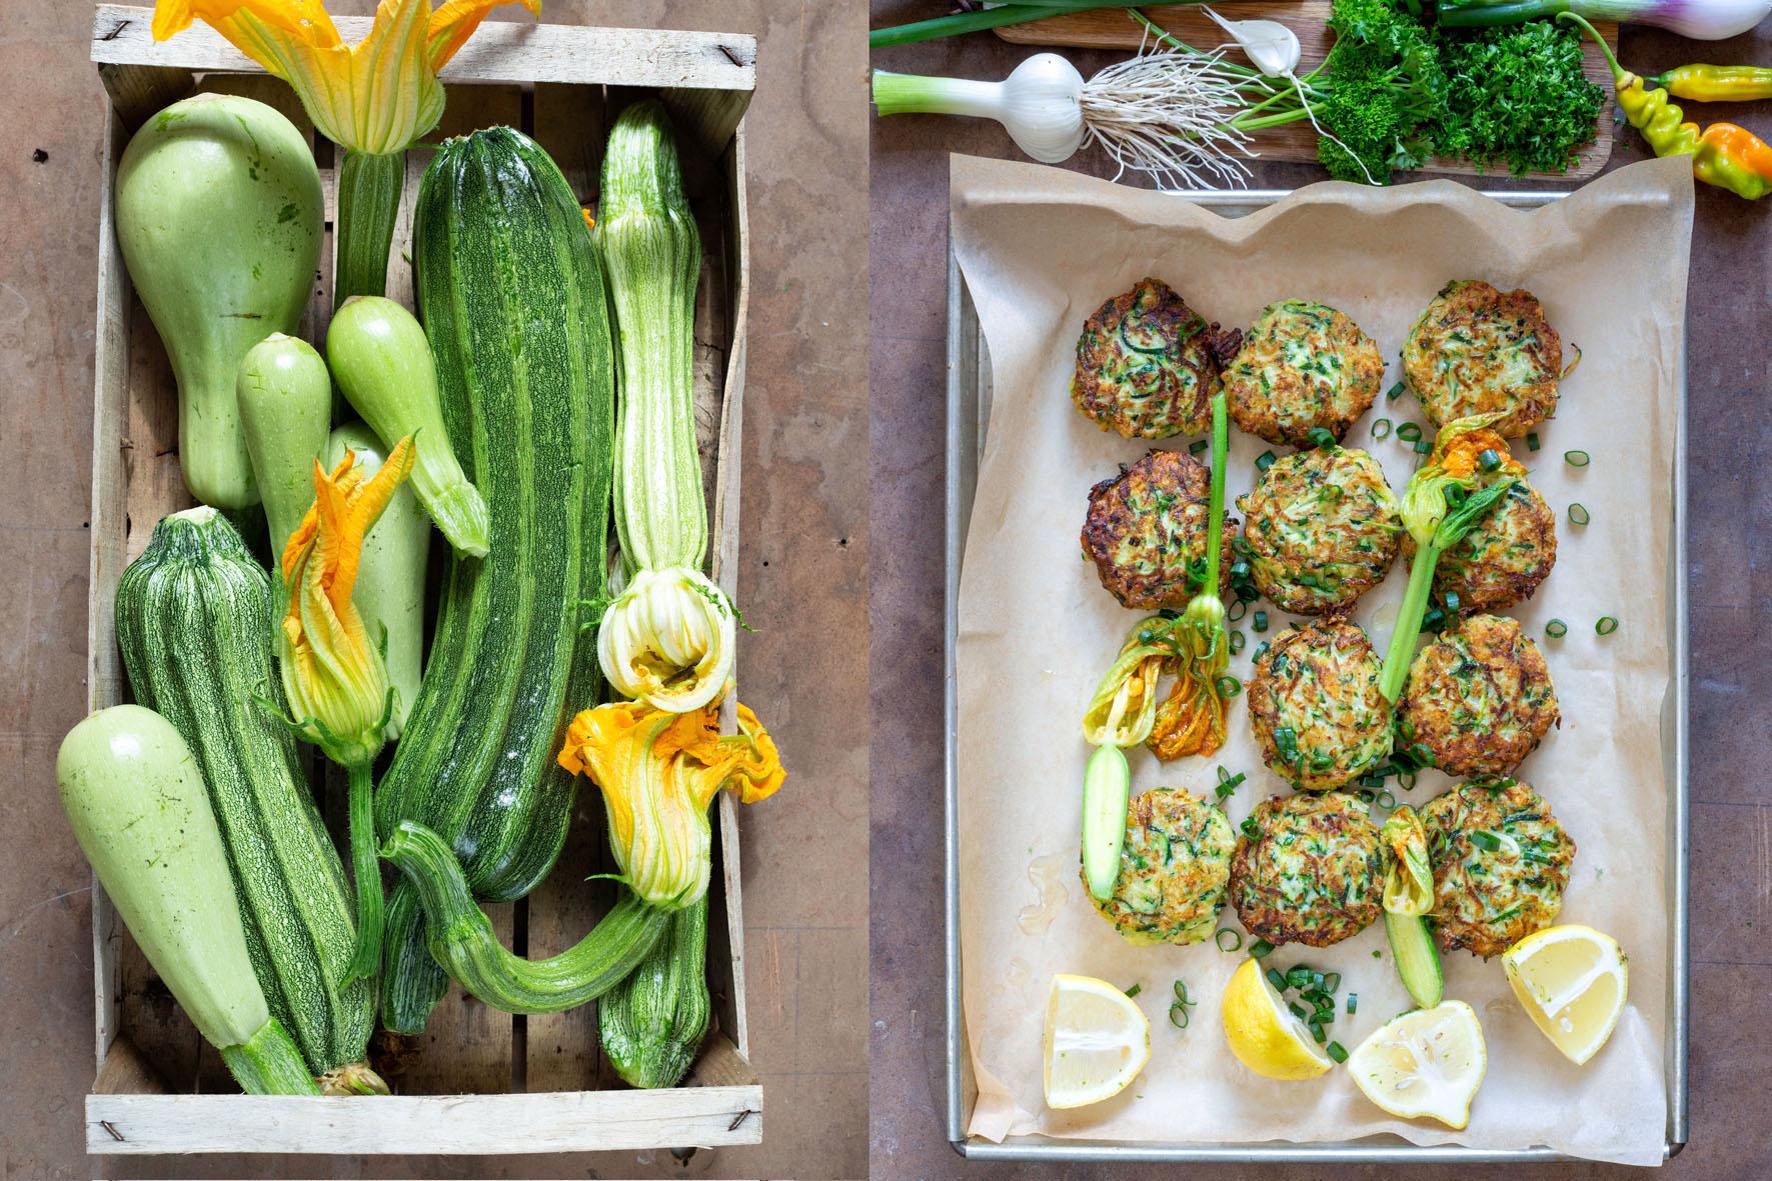 skogtillbord-zucchinifritters-aug20